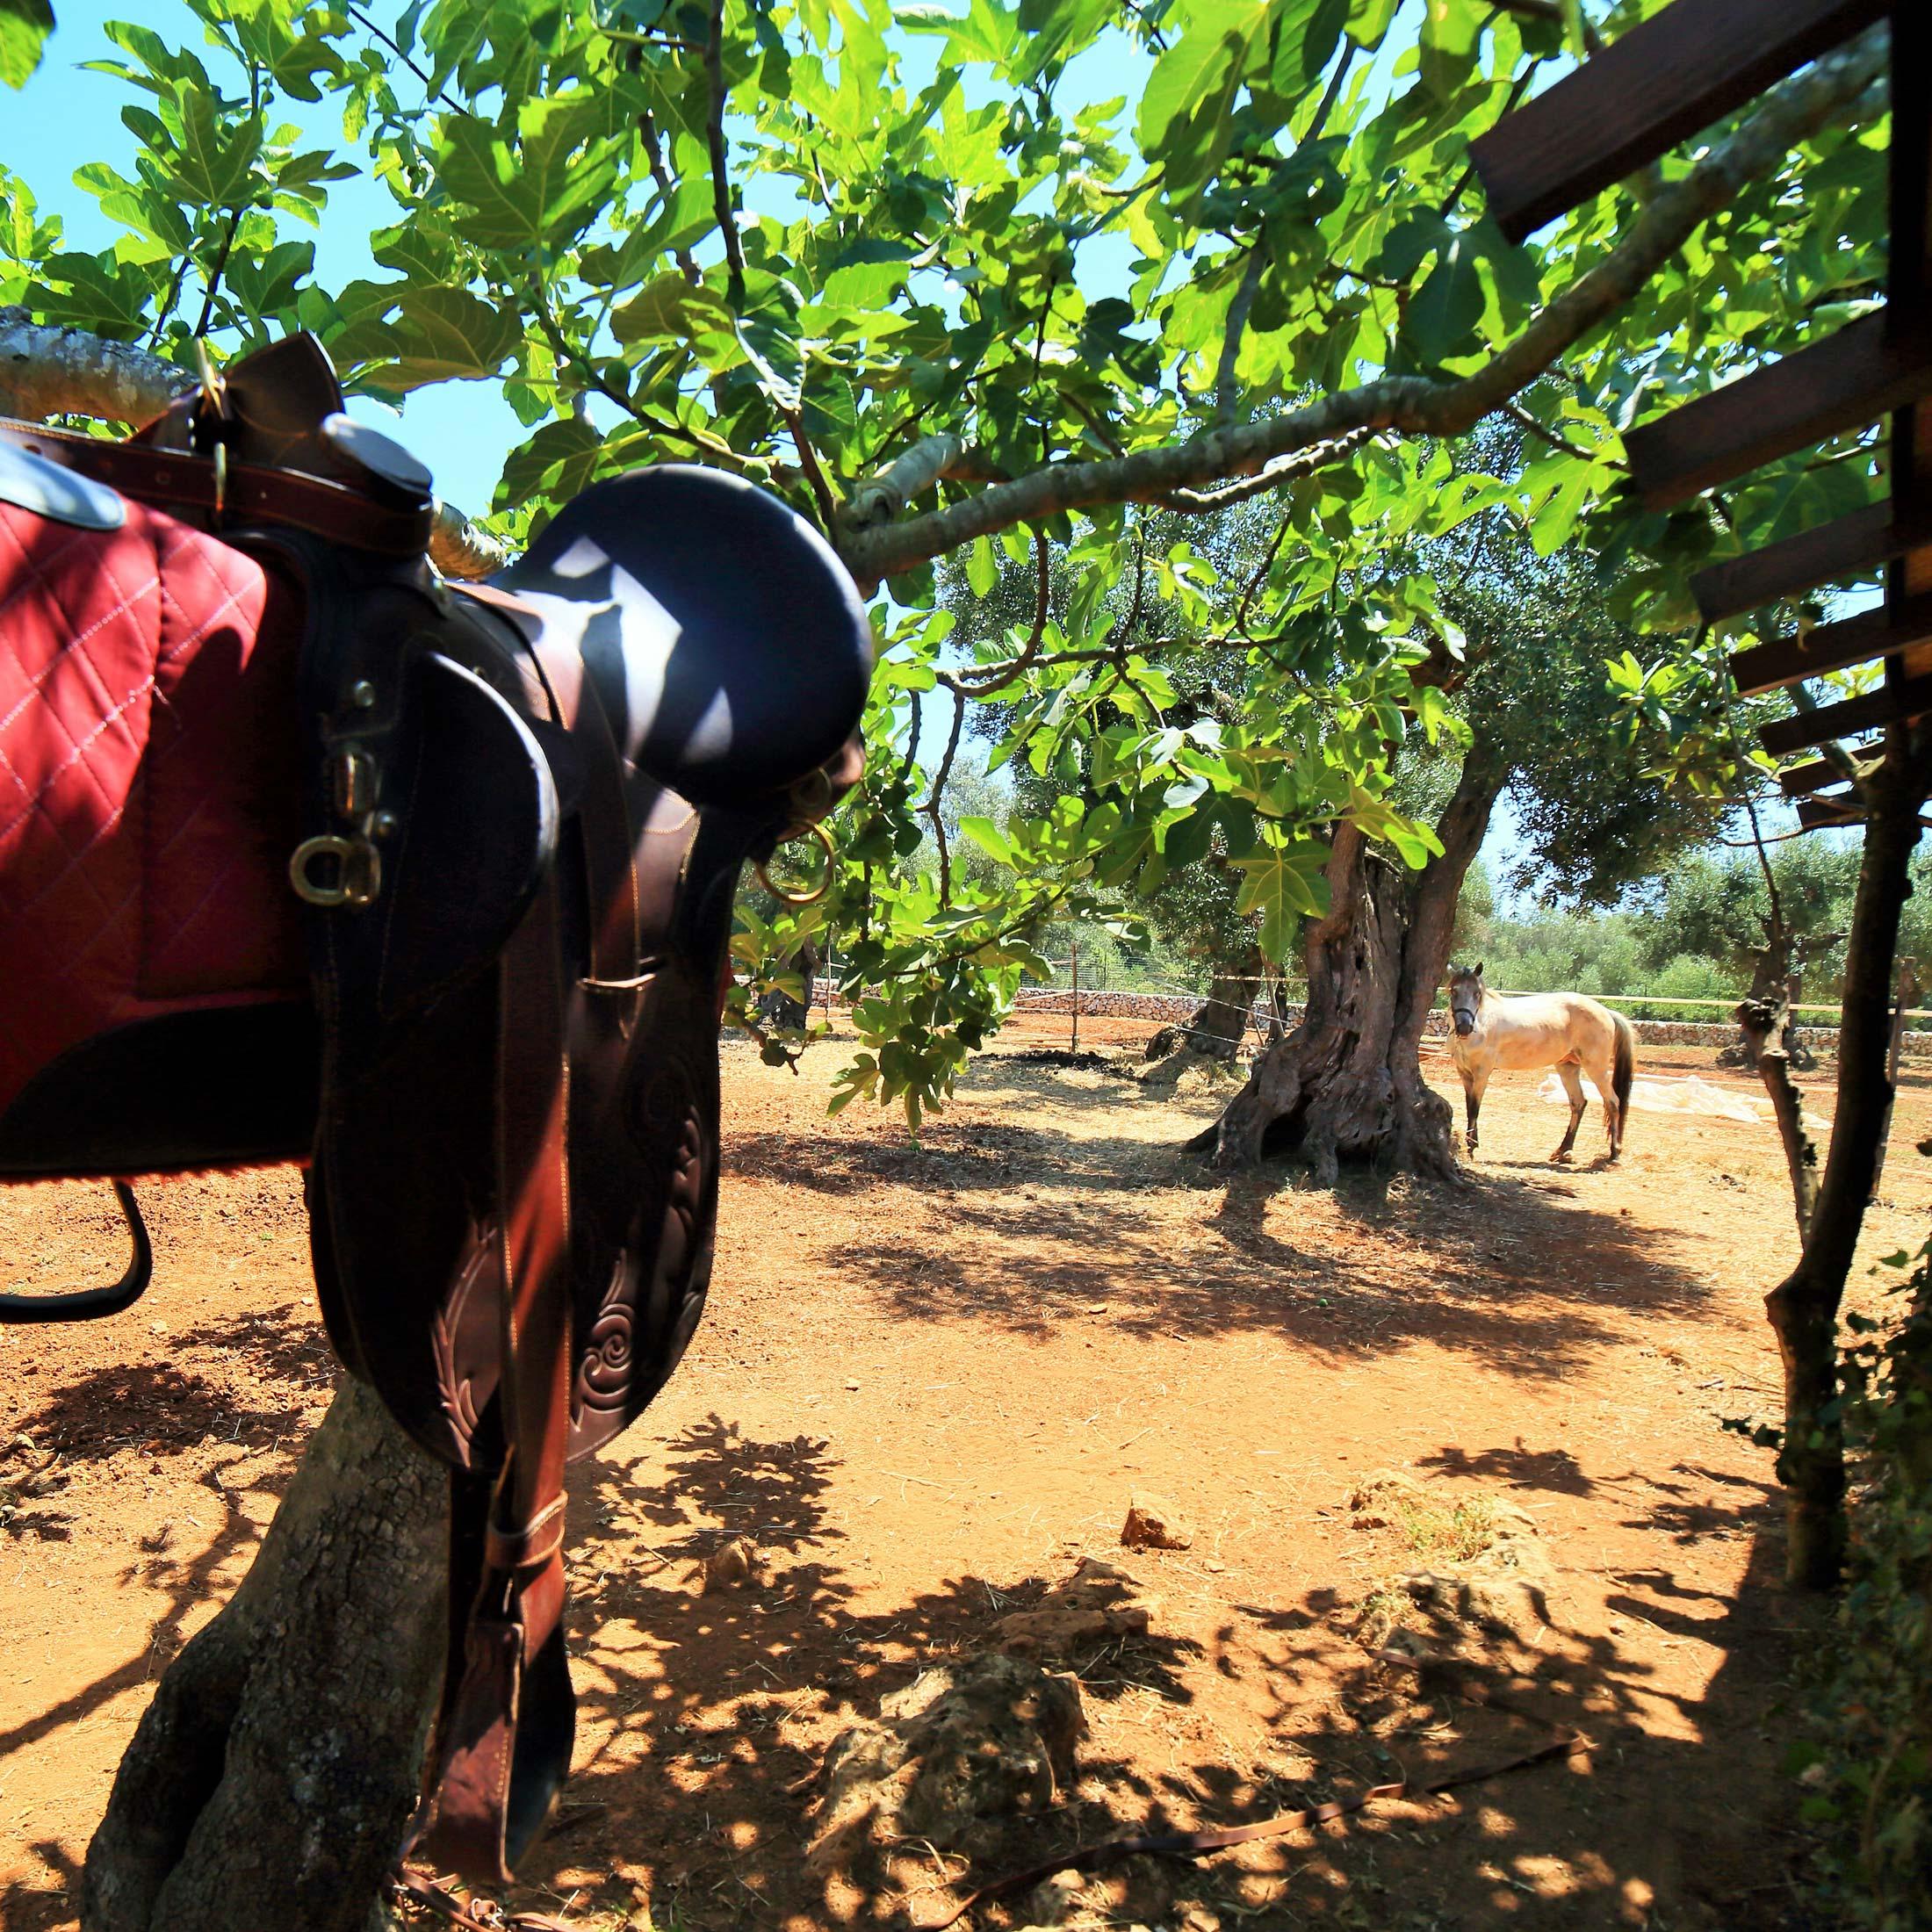 agricola-puglia-agriturismo-stalla